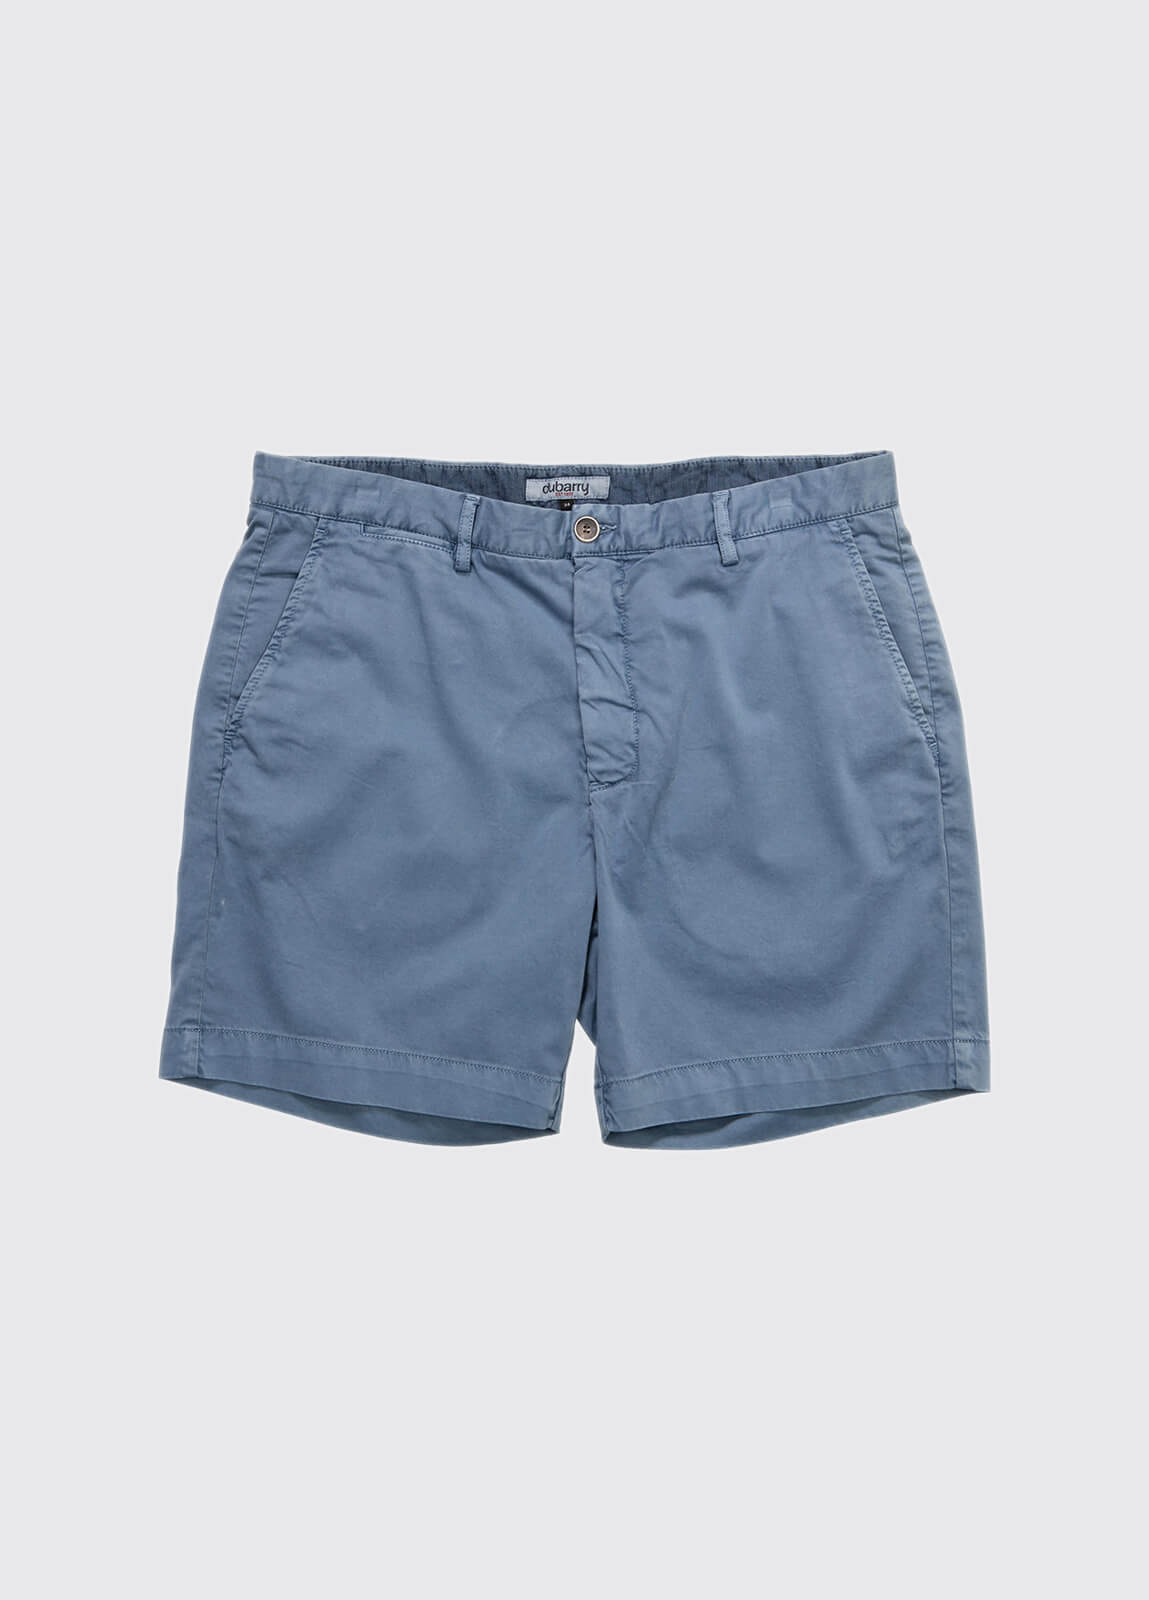 Glandore Men's Shorts - Denim